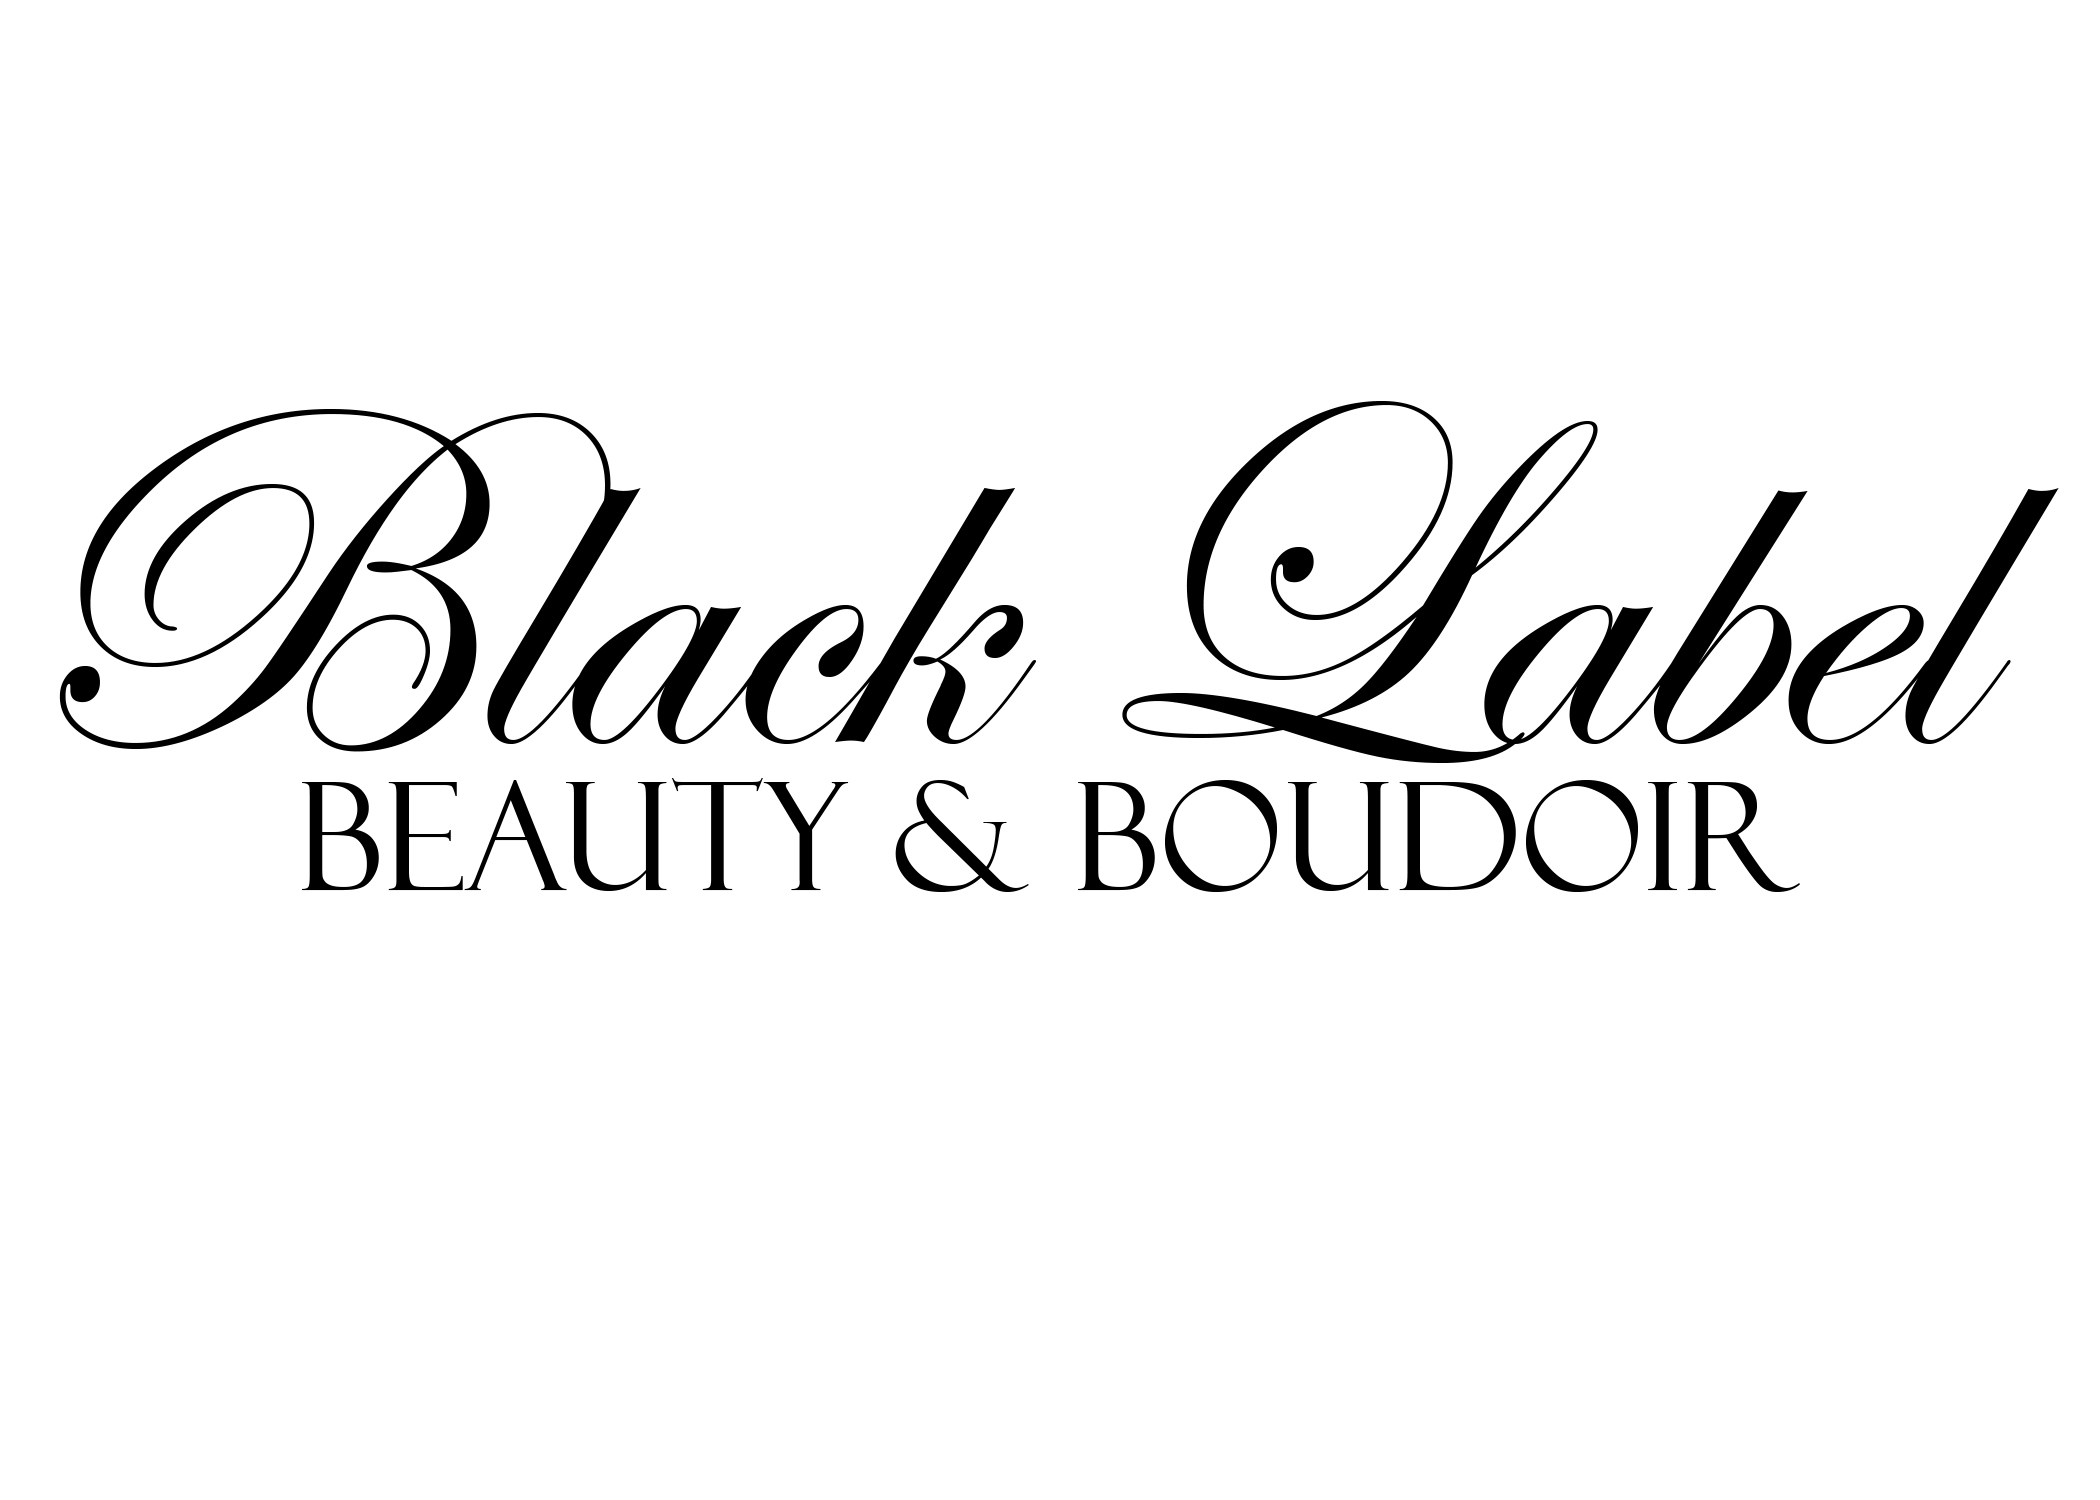 BlackLabeljpg.jpg